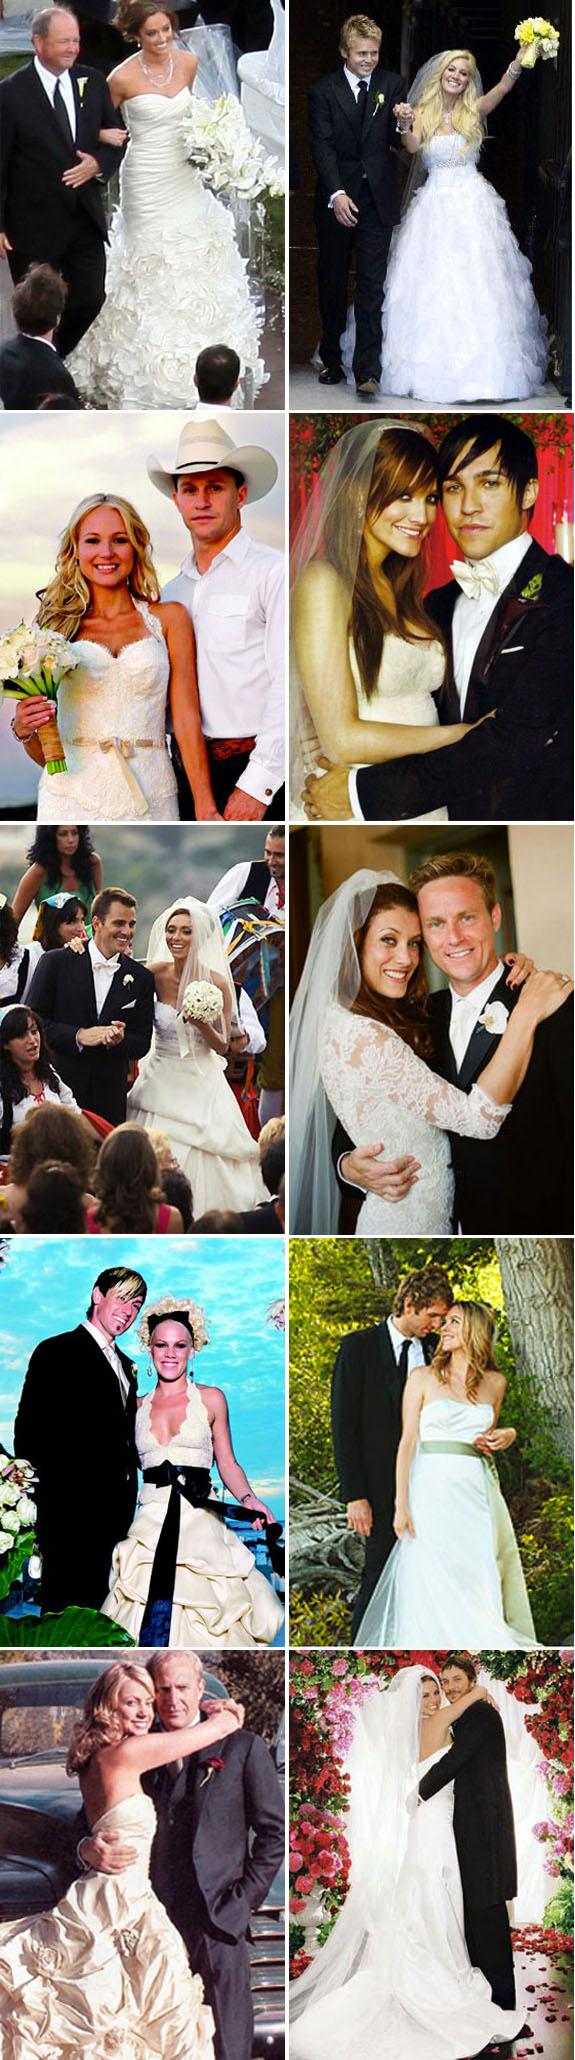 Celebrity Wedding Style: Monique Lhuillier | PreOwned Wedding Dresses